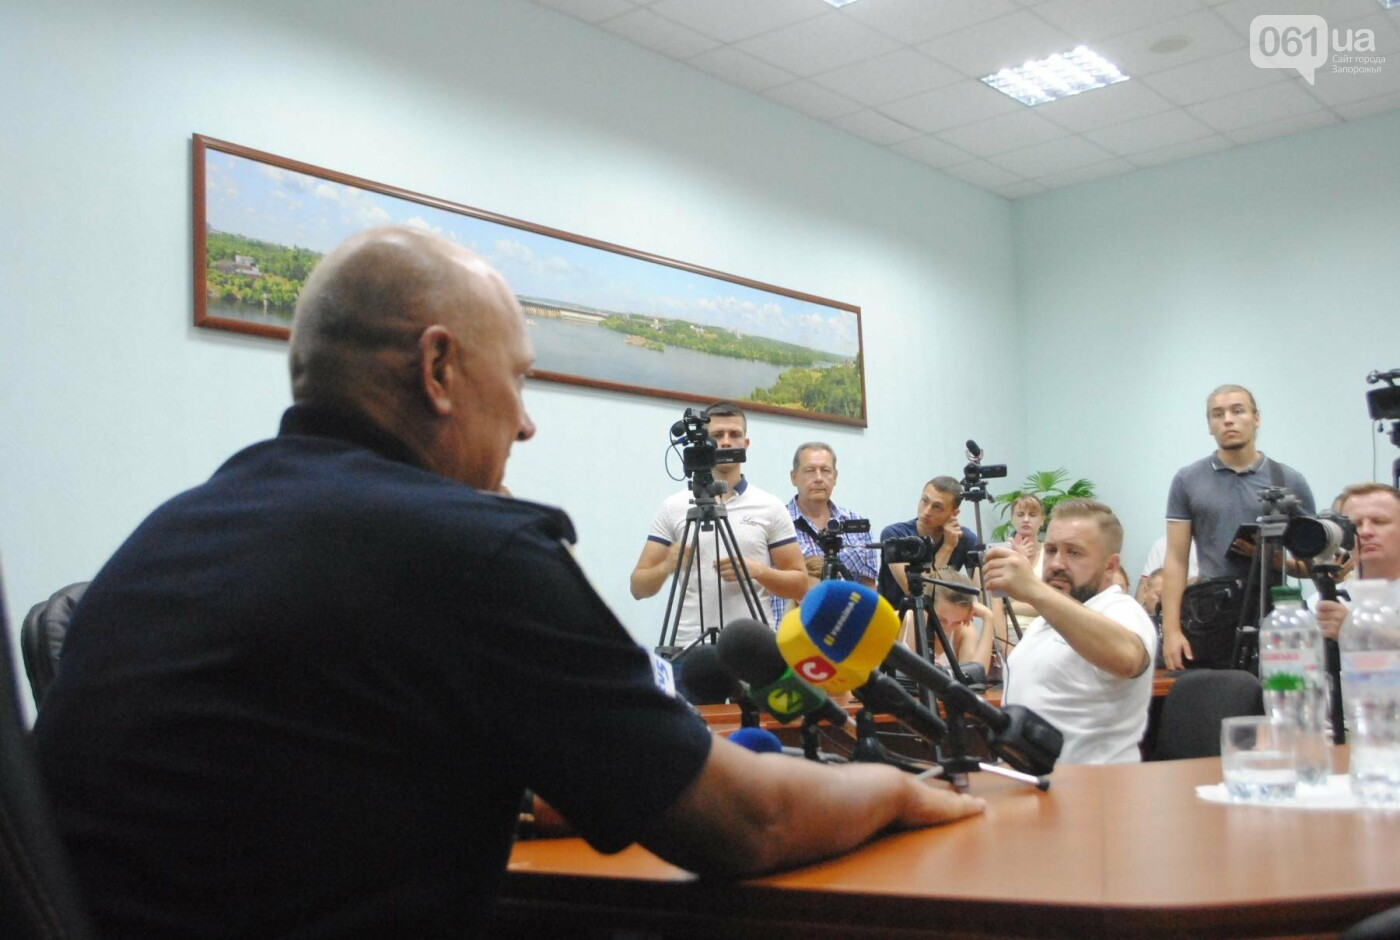 За Олешко следили два дня: в полиции рассказали подробности покушения в Бердянске, - ФОТО, фото-5